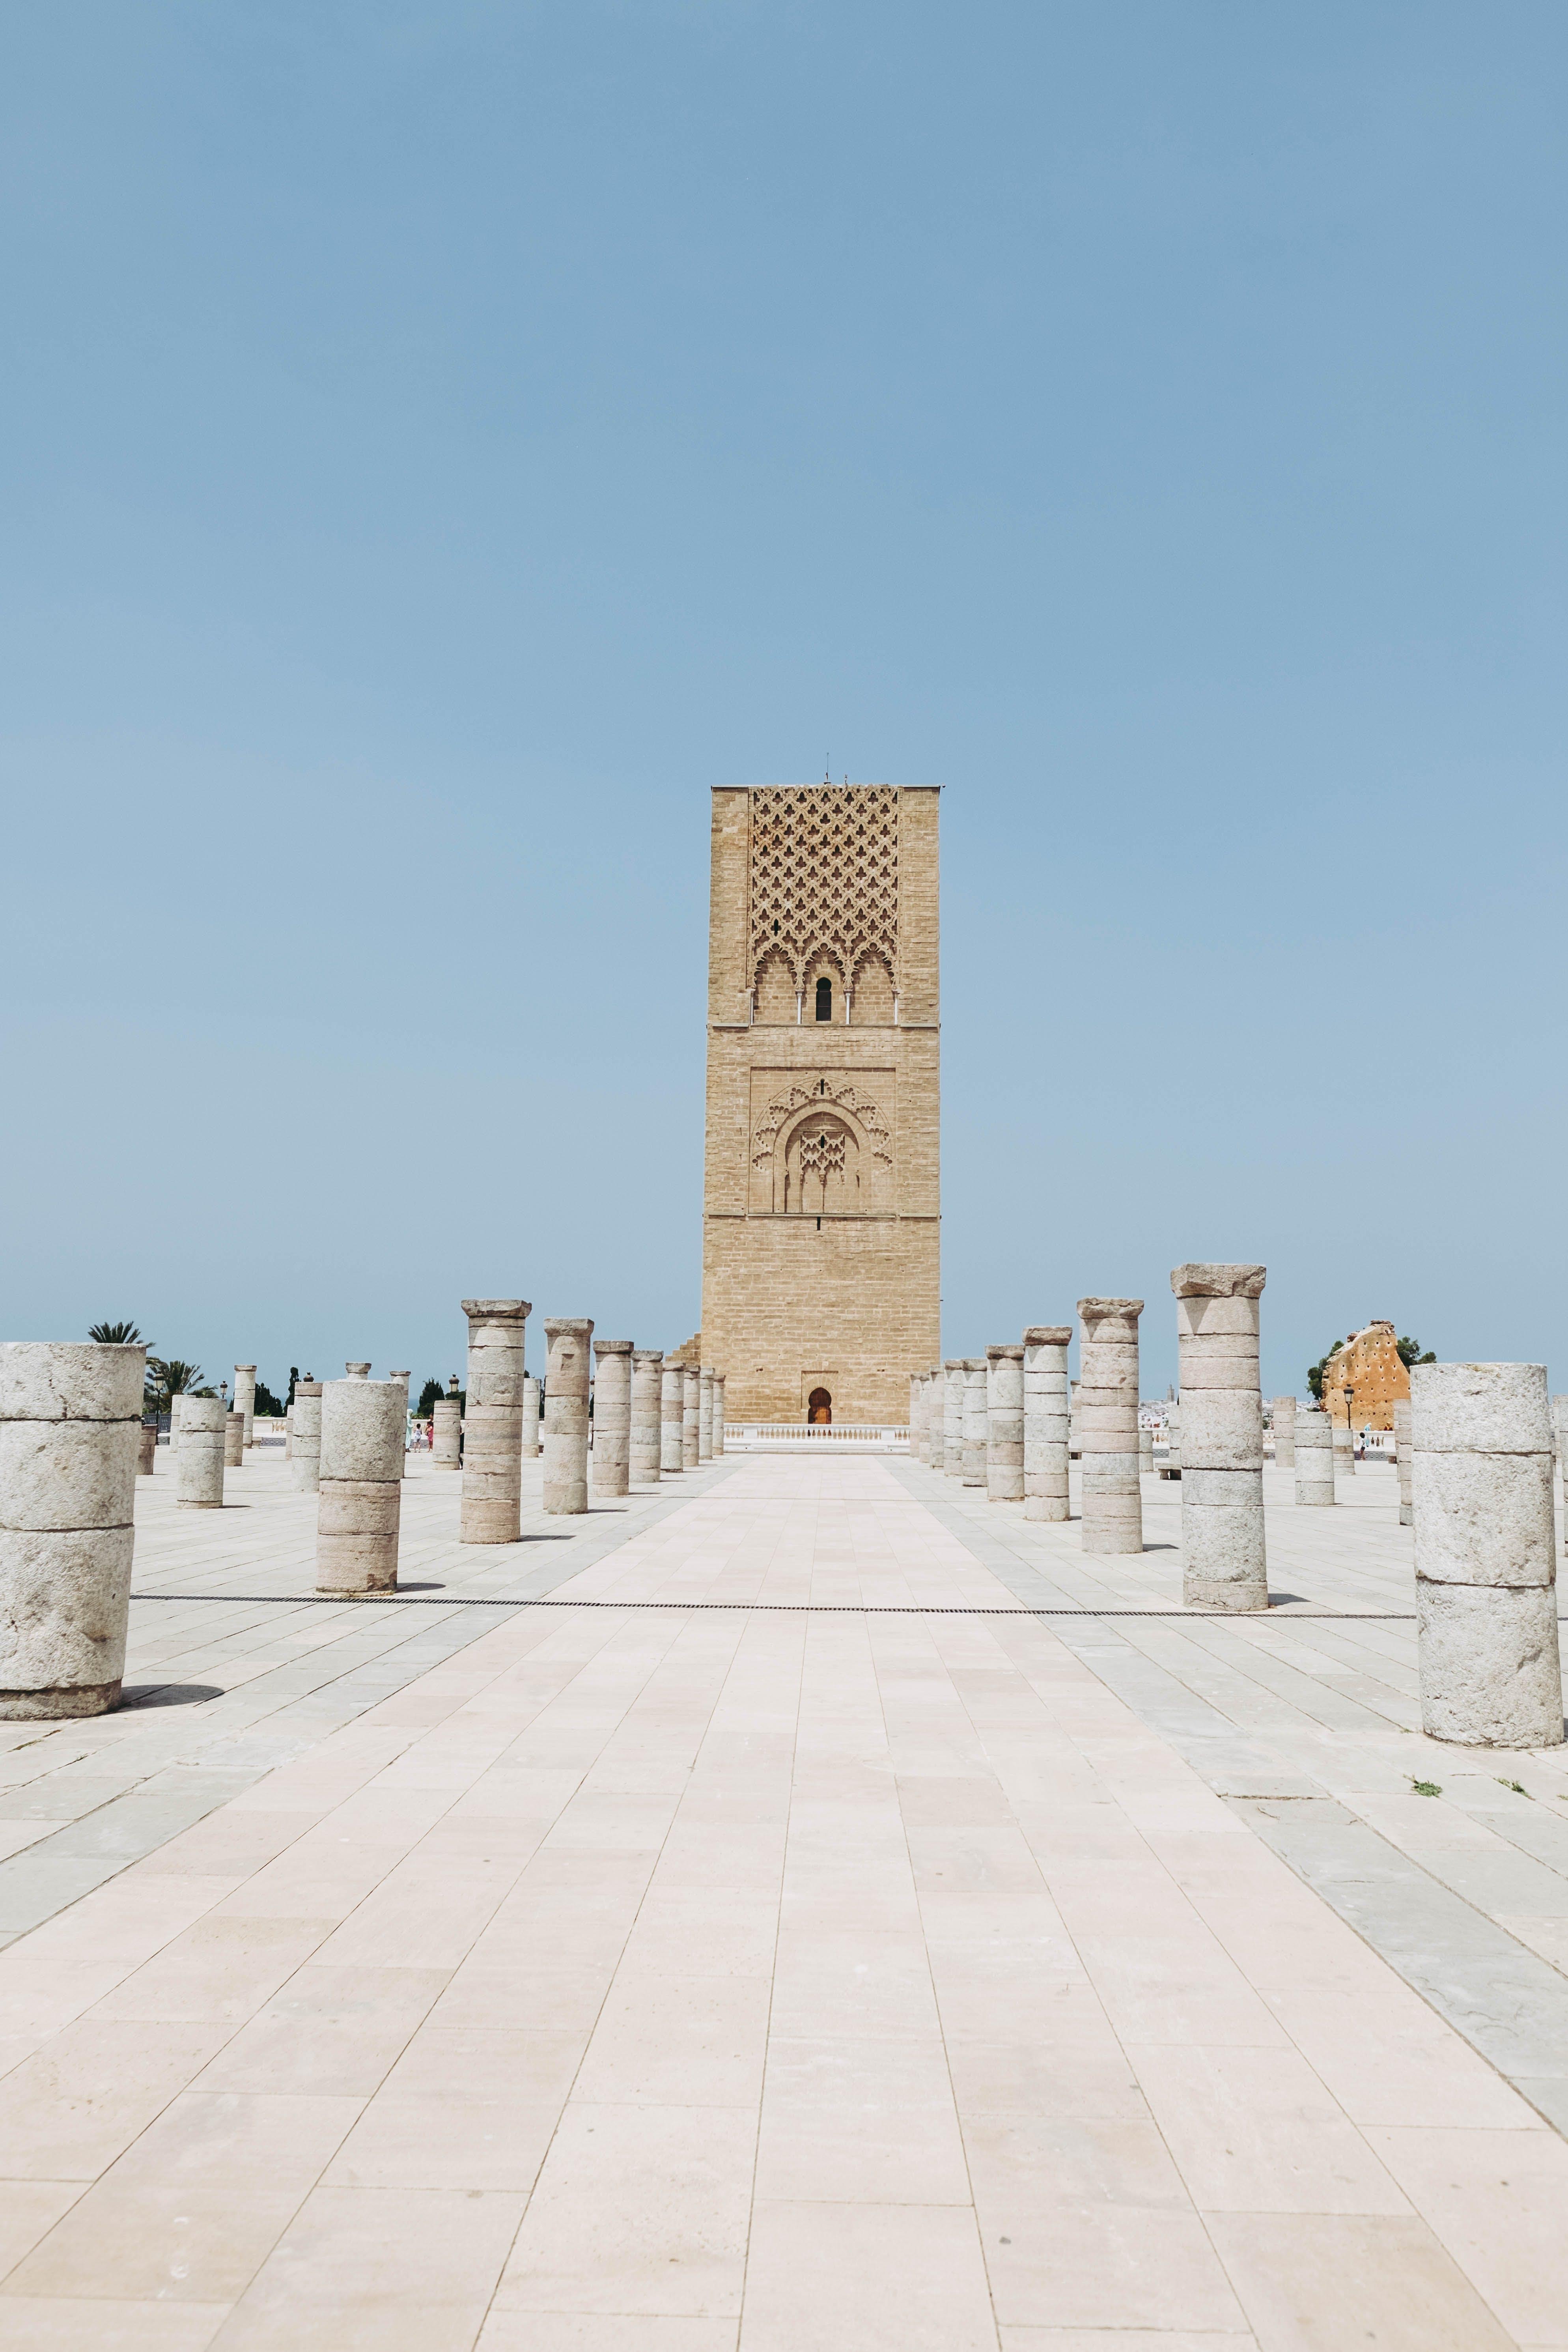 Beige Concrete Monument